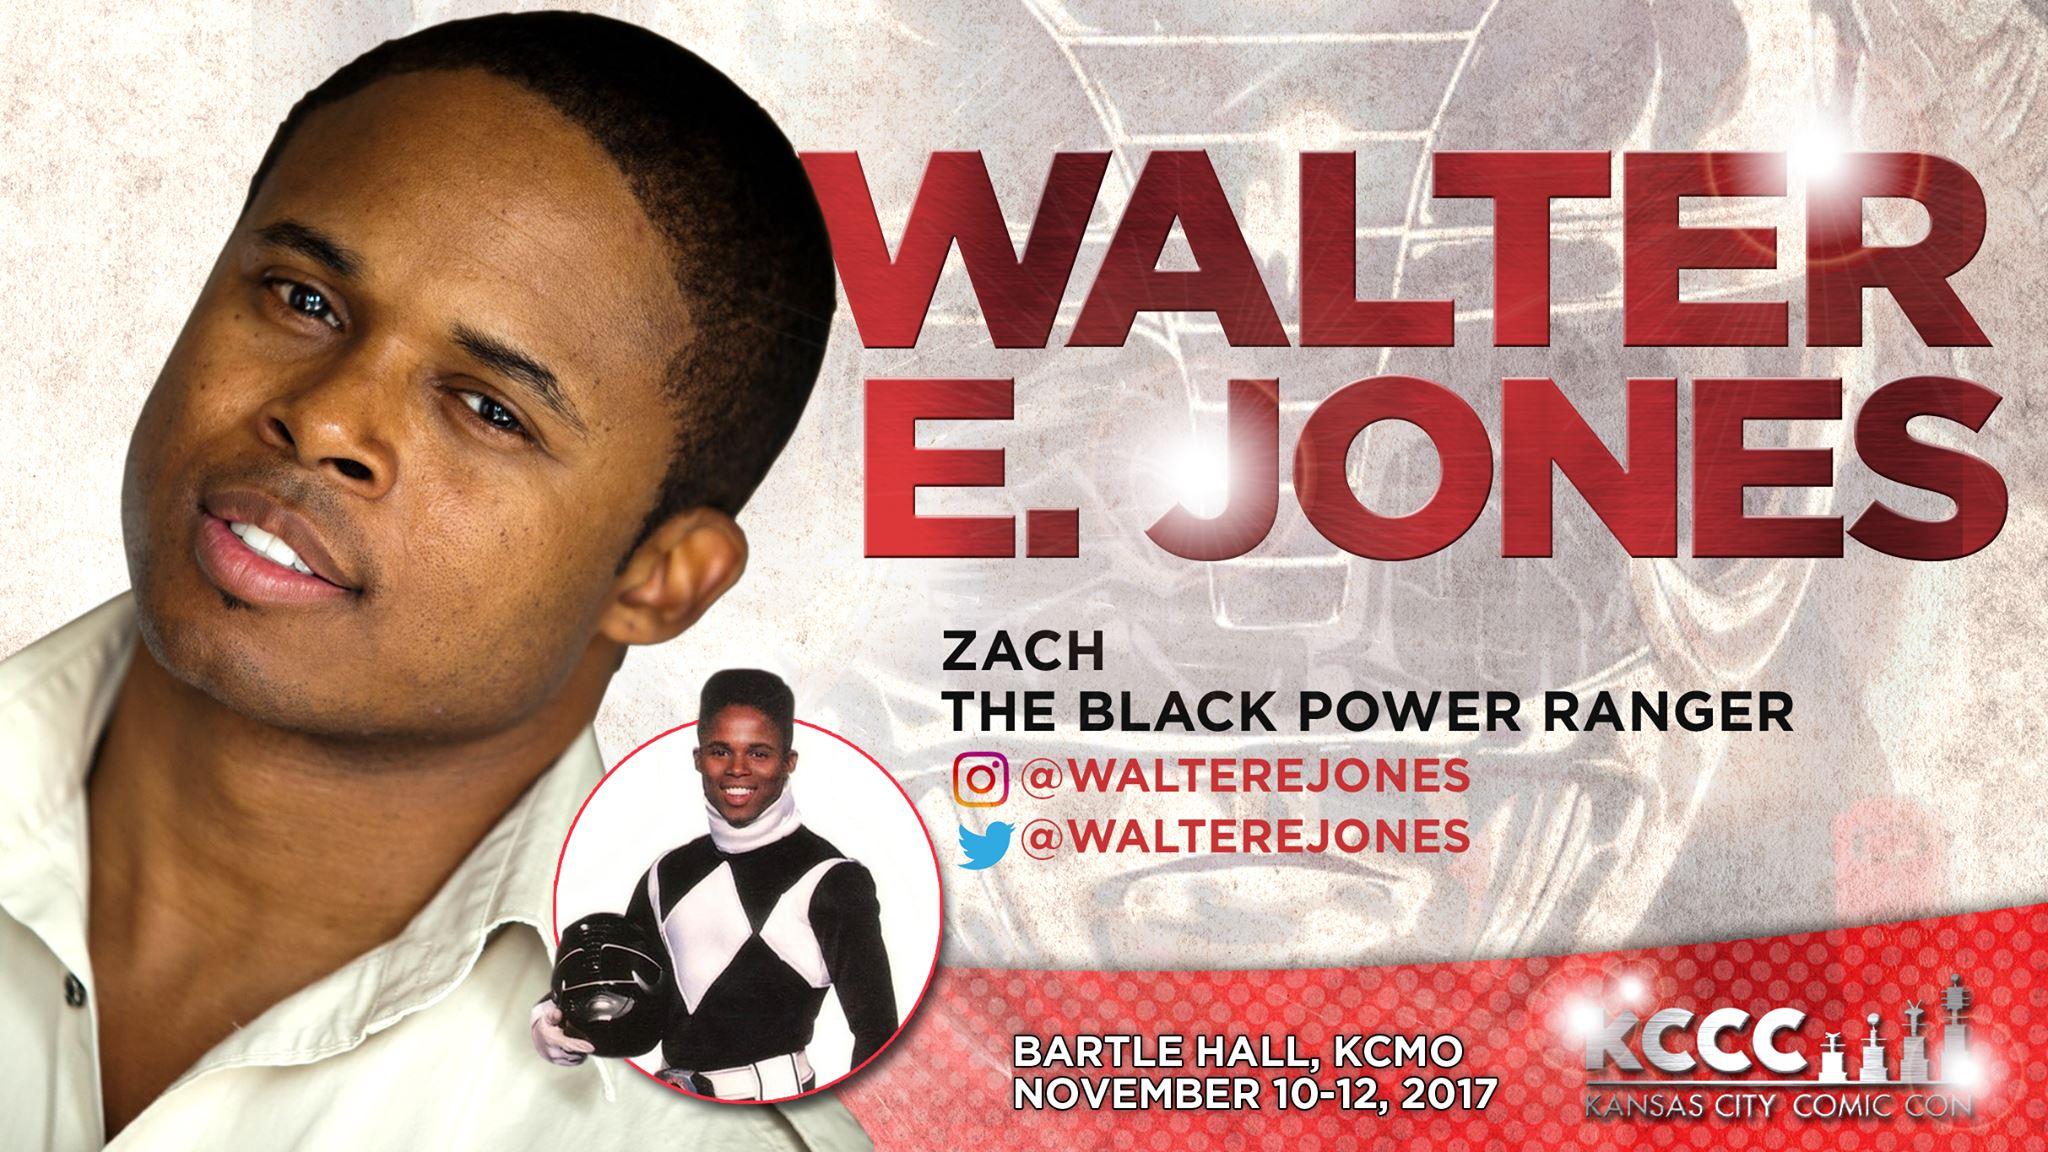 WalterJones.jpg